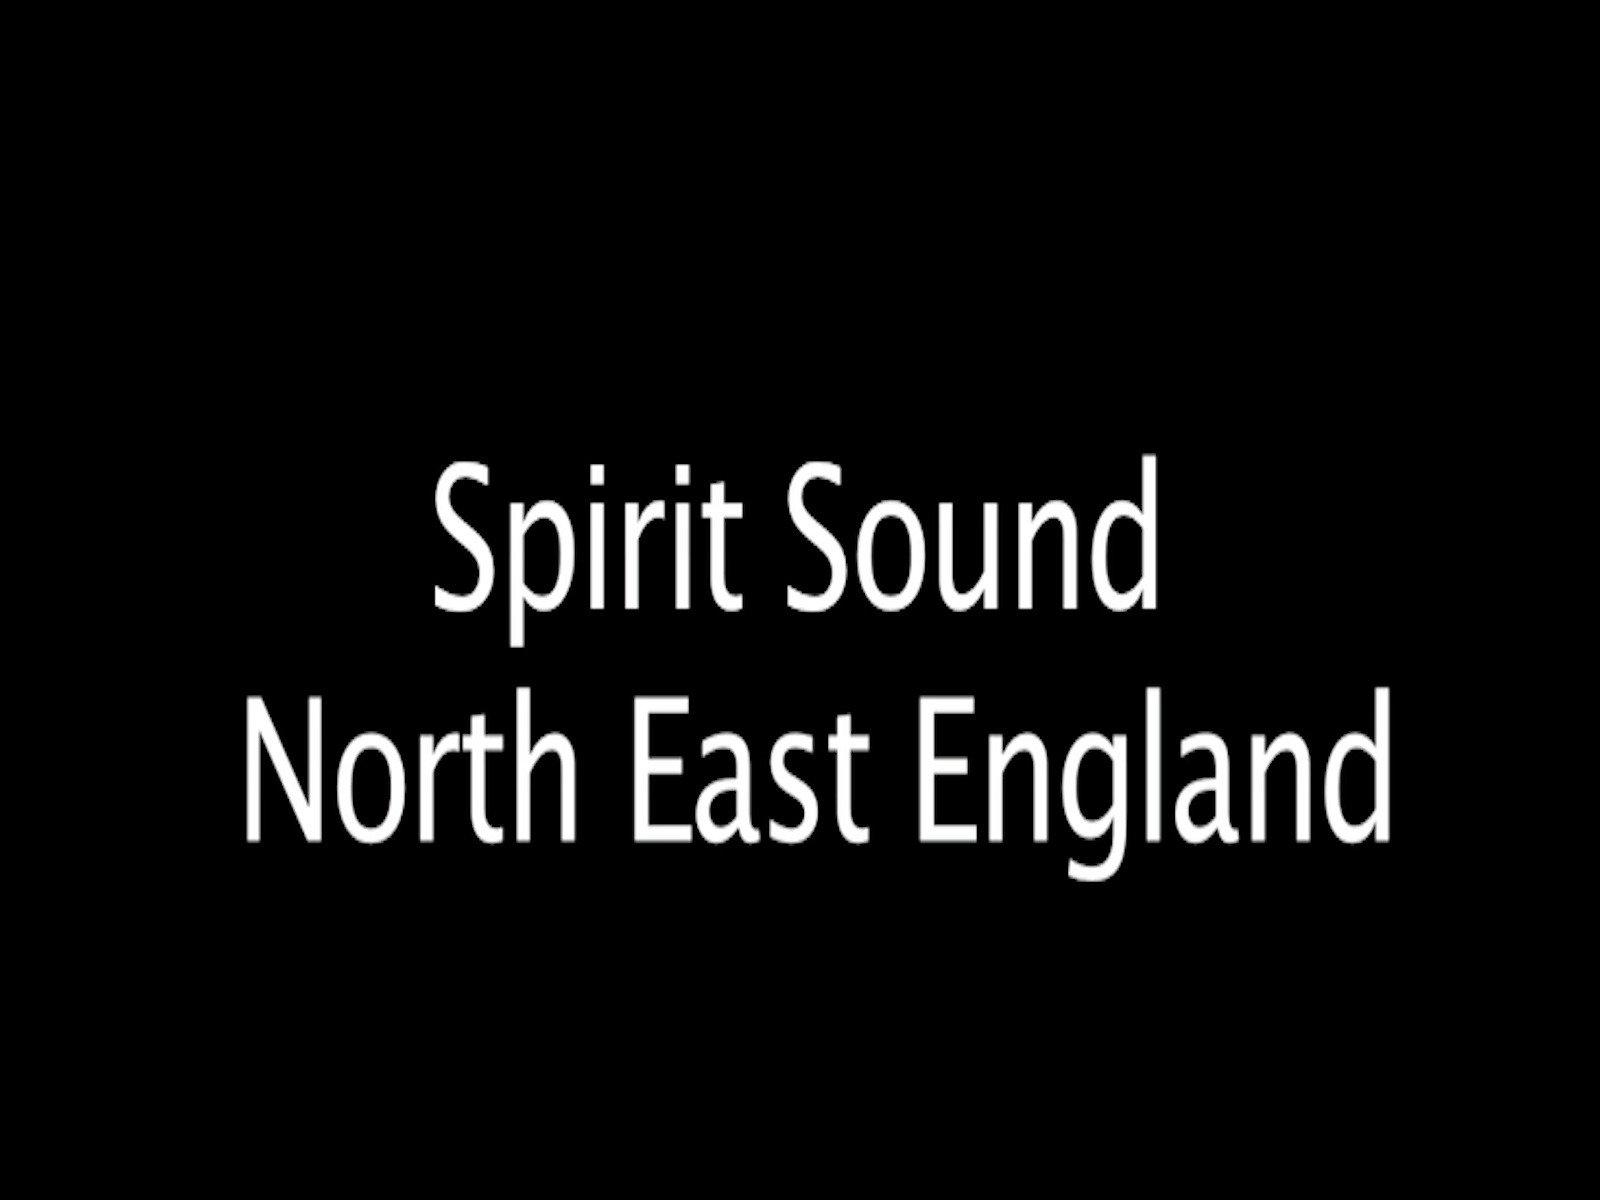 Spirit Sound North East England on Amazon Prime Video UK